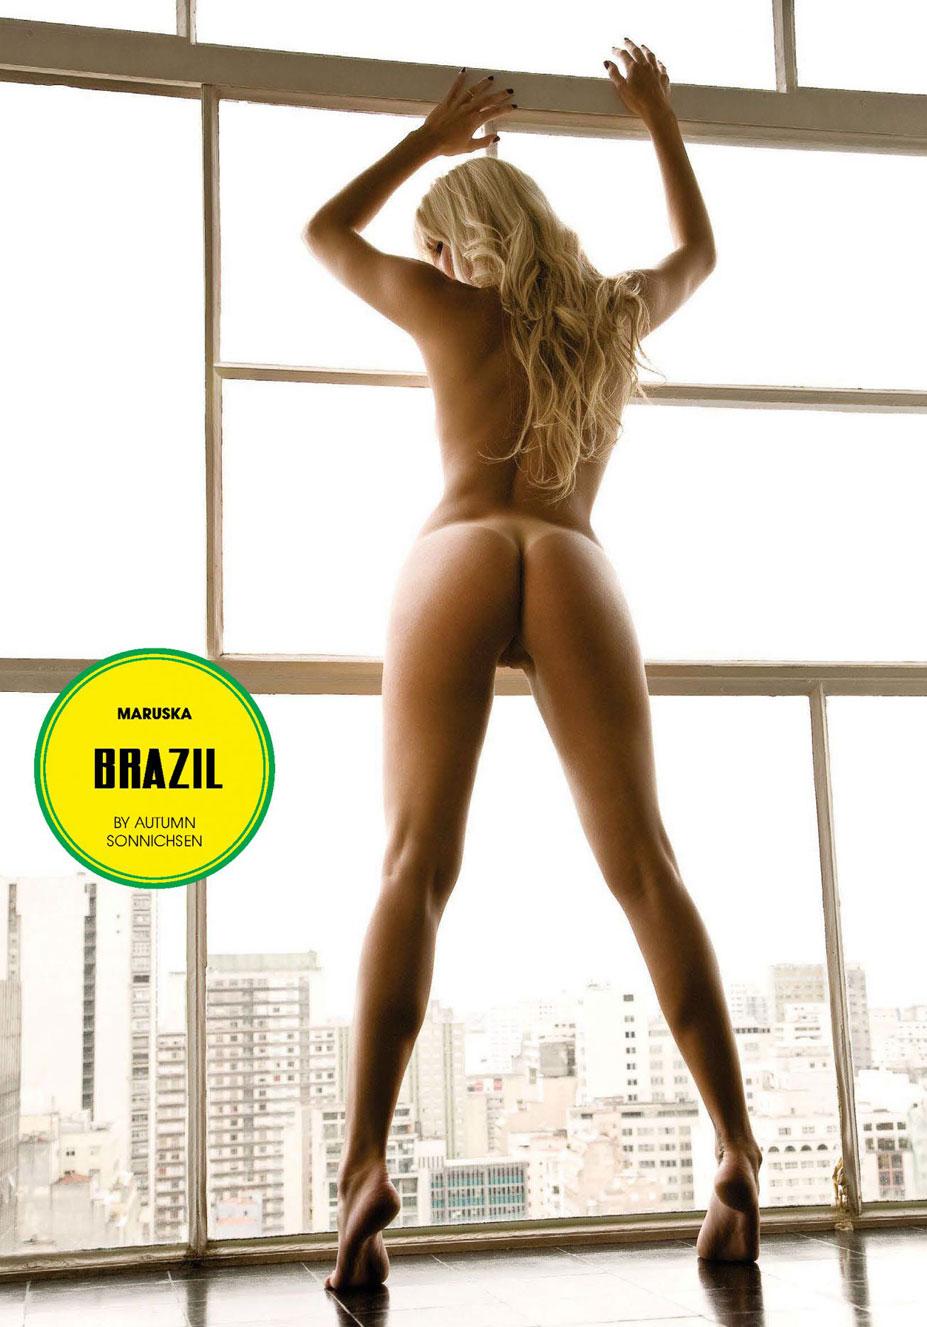 Brazil / Maruska - Playboy South Africa june 2014 / FIFA Fever